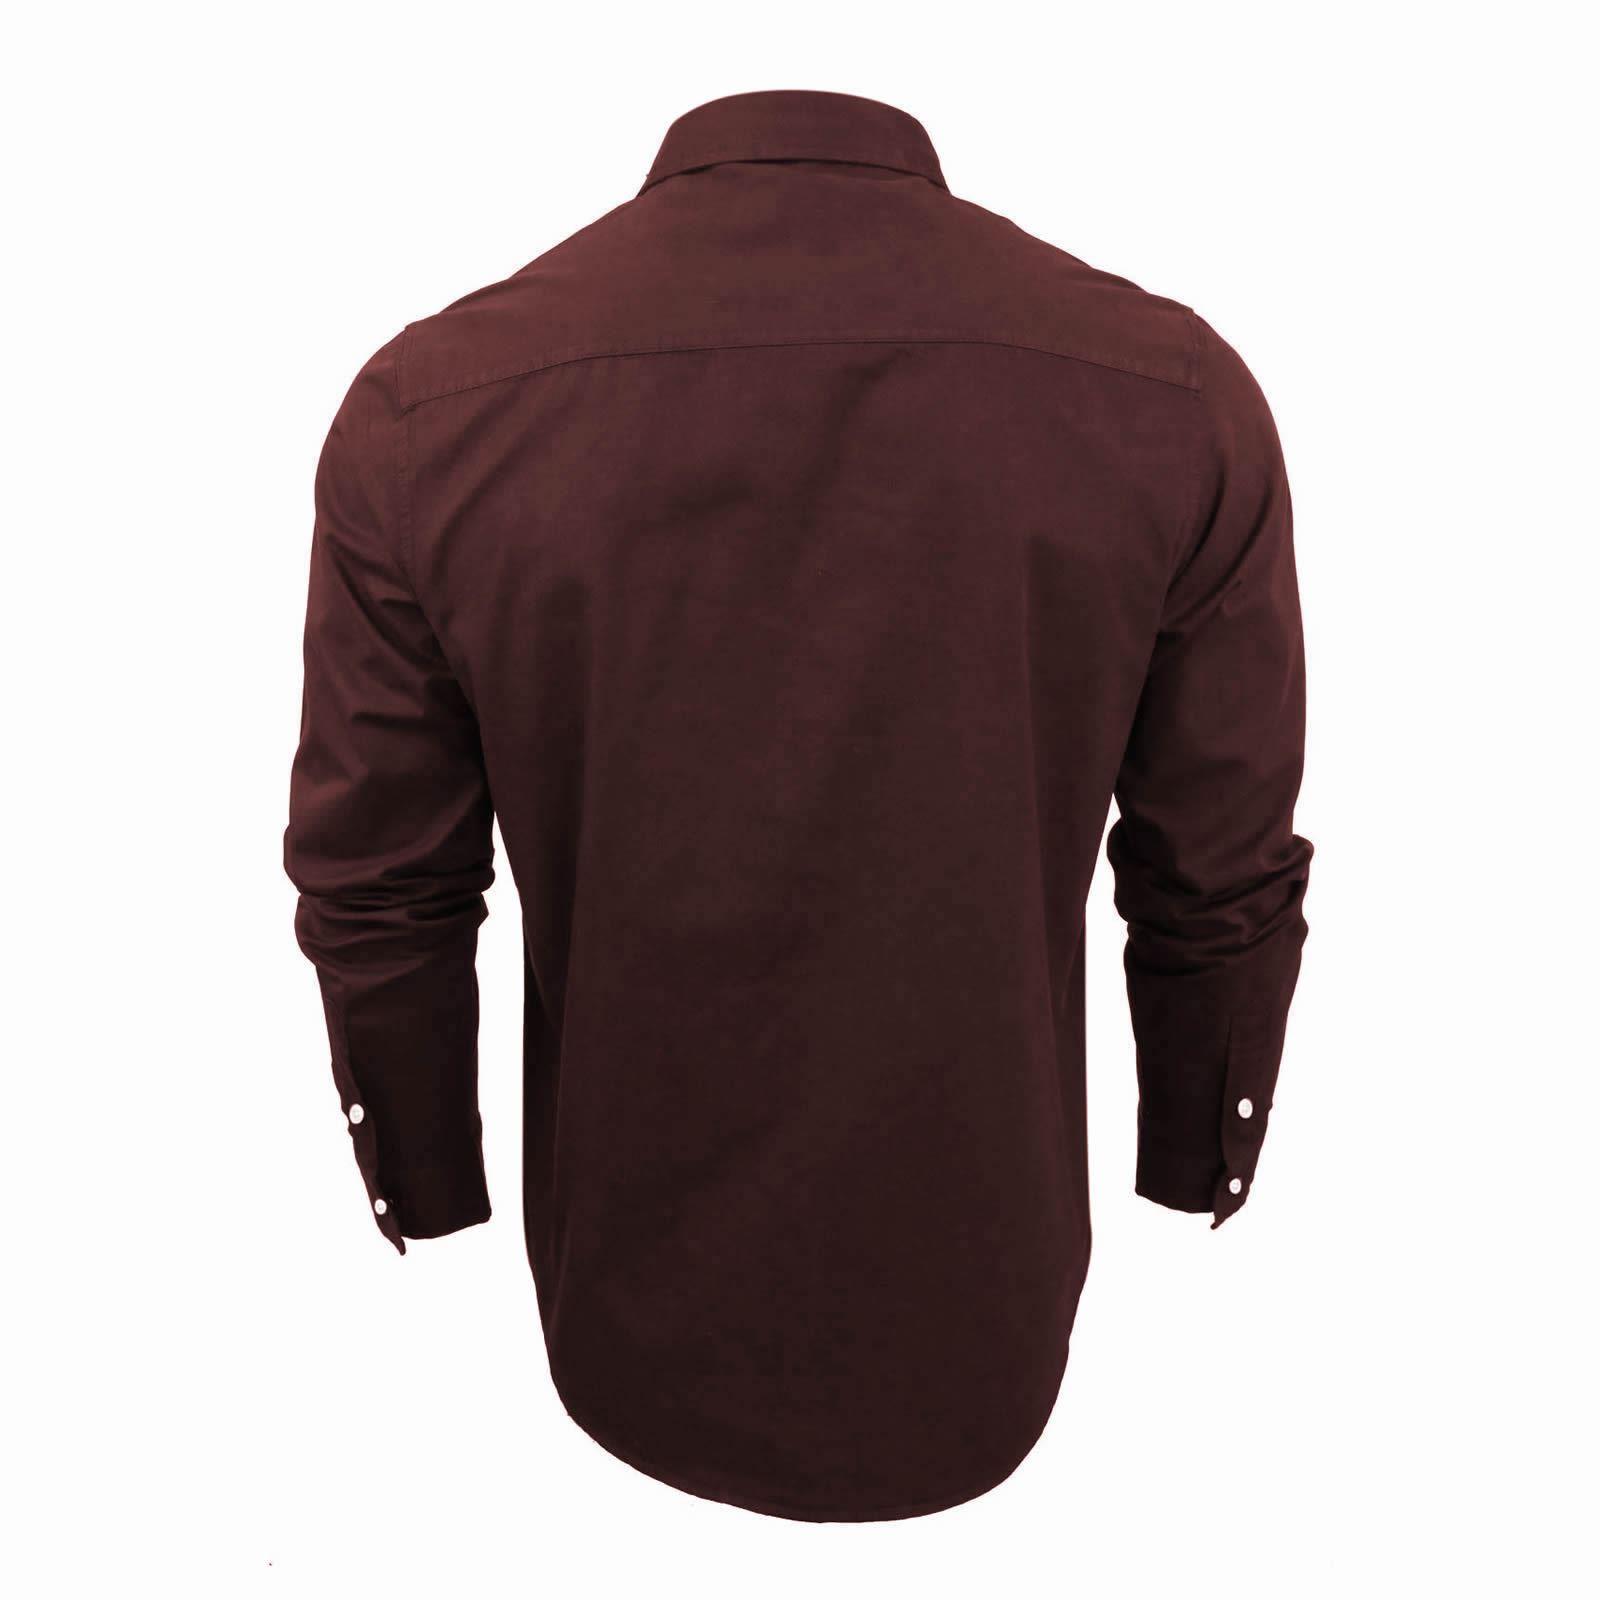 Mens-Shirt-Brave-Soul-Holmes-Long-Sleeve-Cotton-Canvas-Casual-Top thumbnail 7